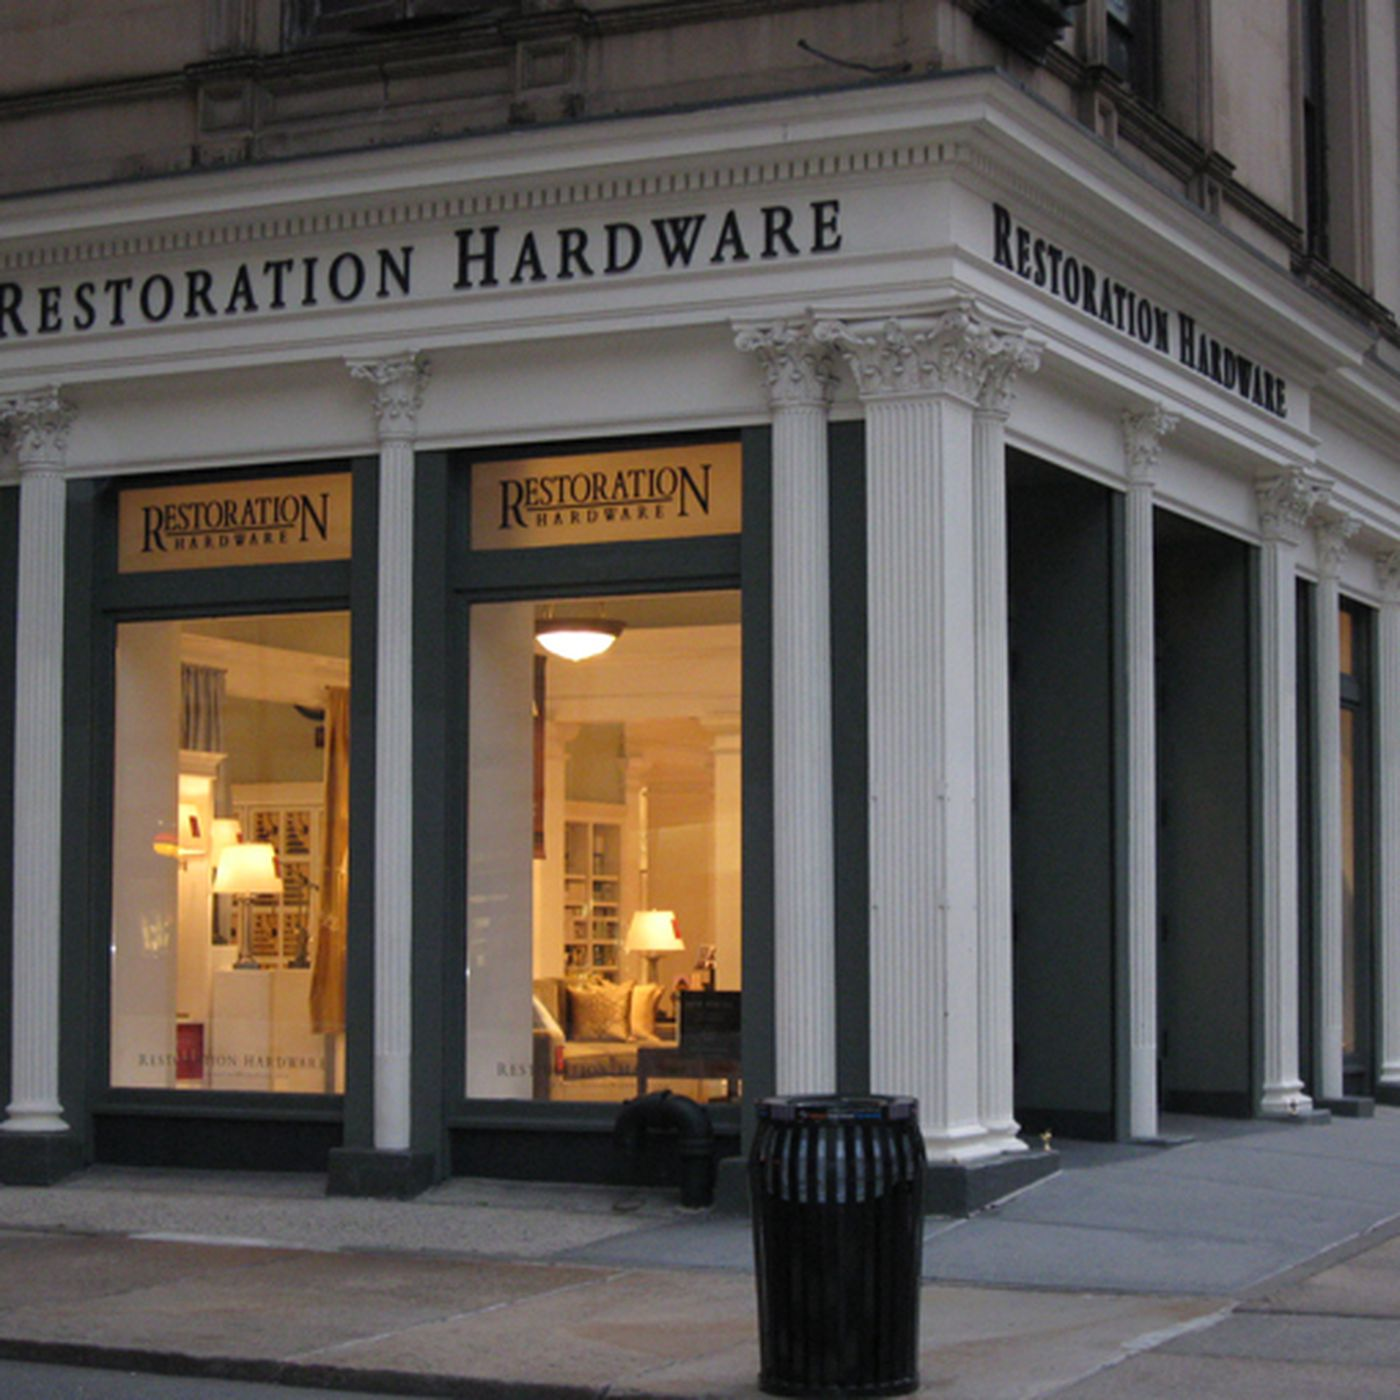 Restoration Hardware Gets New Look